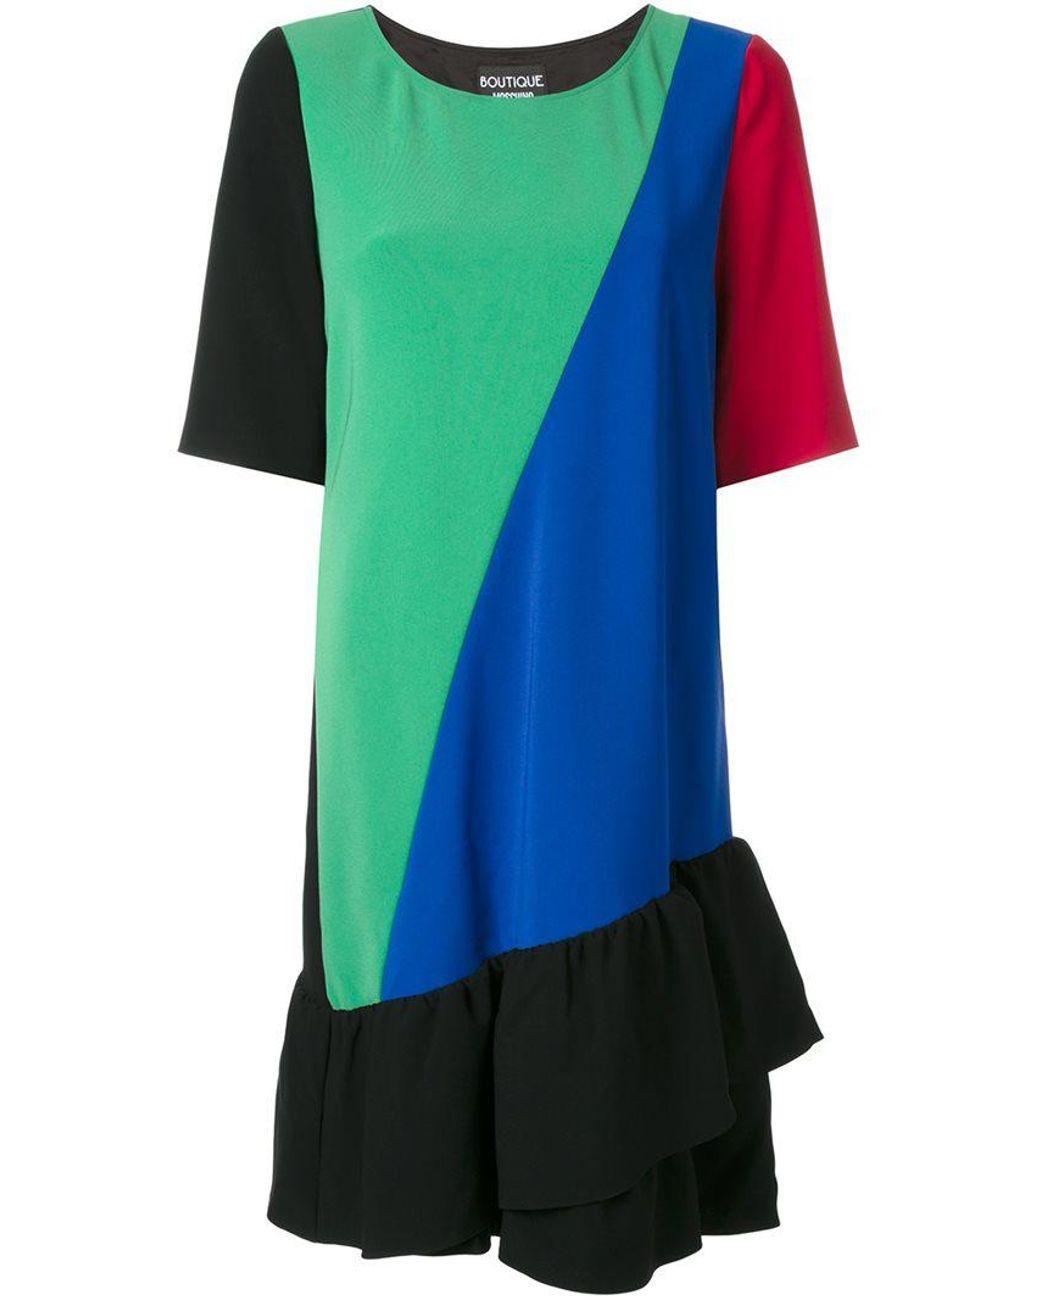 9fc1c70796 Boutique Moschino Dress Sale | Saddha